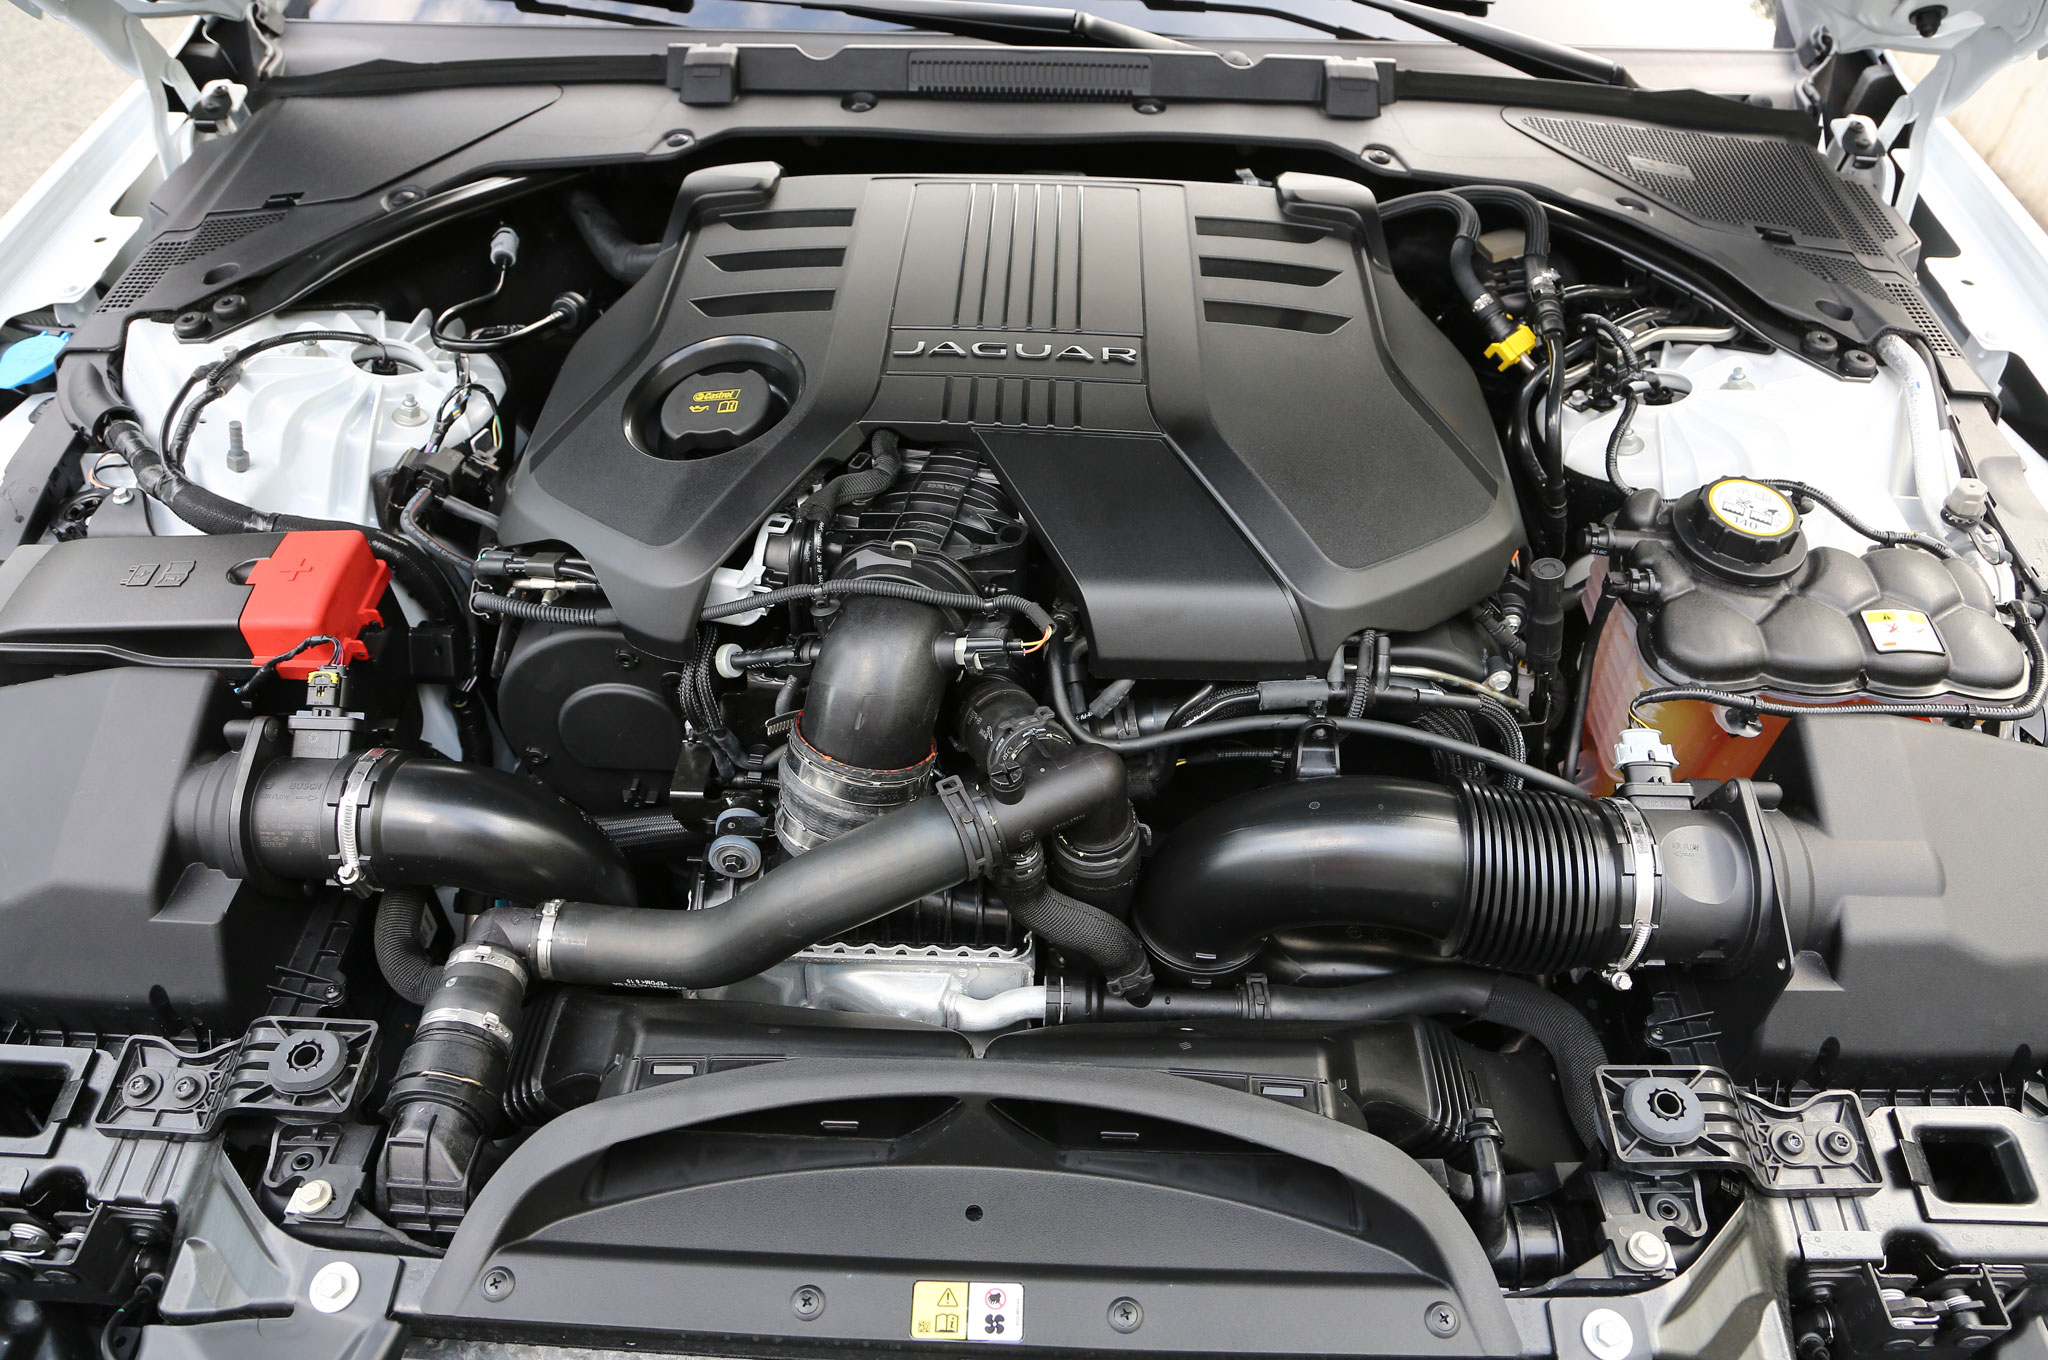 jag long copy dennis donovan sale xjc of jaguar rebuild penjag digital for camera olympus peninsula engine engines